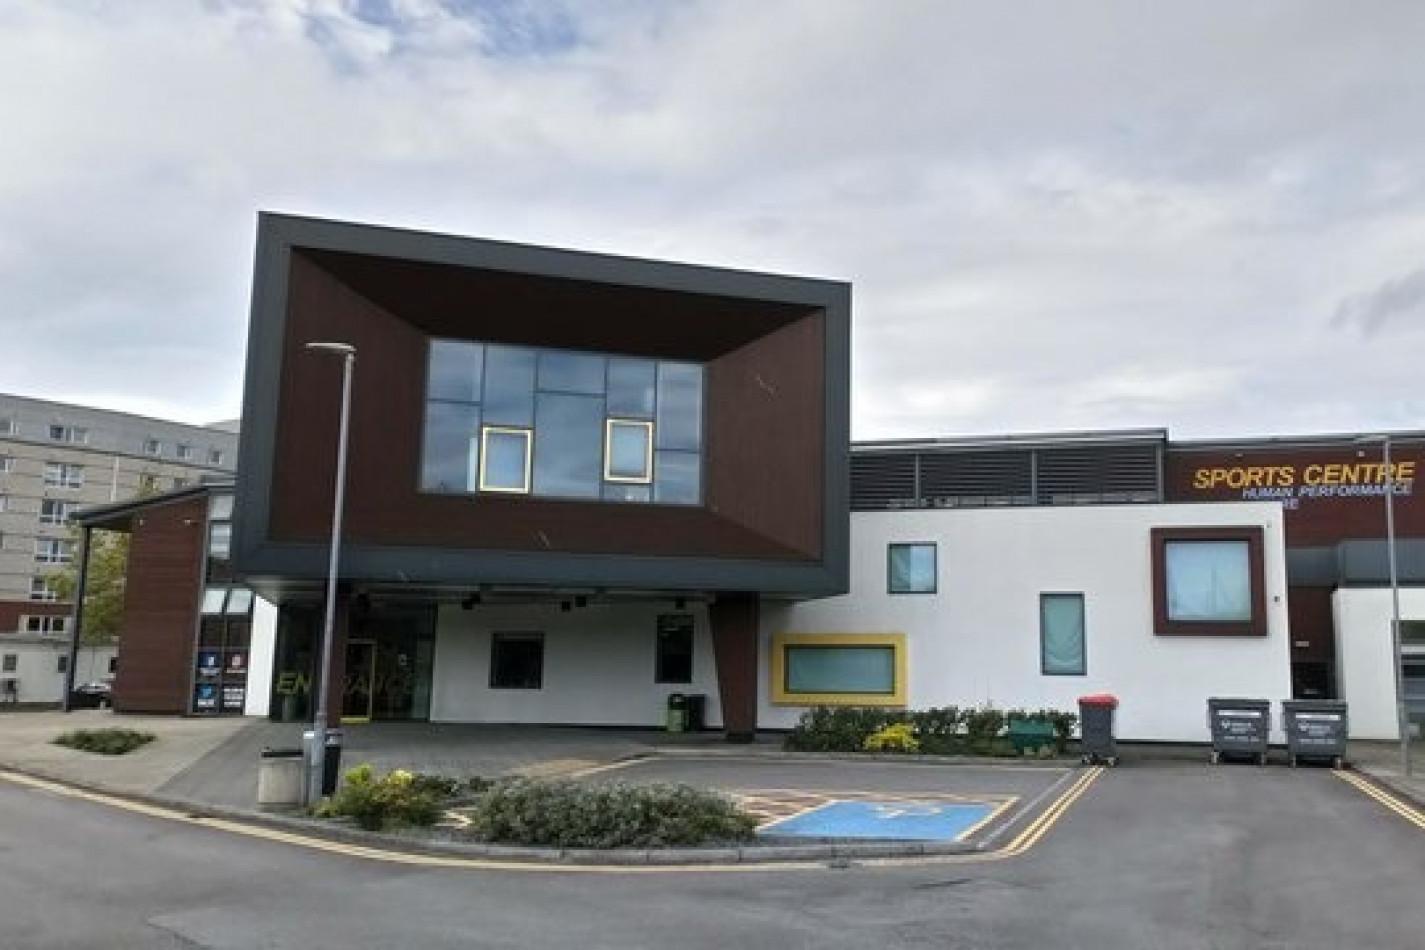 University of Lincoln Sports Centre